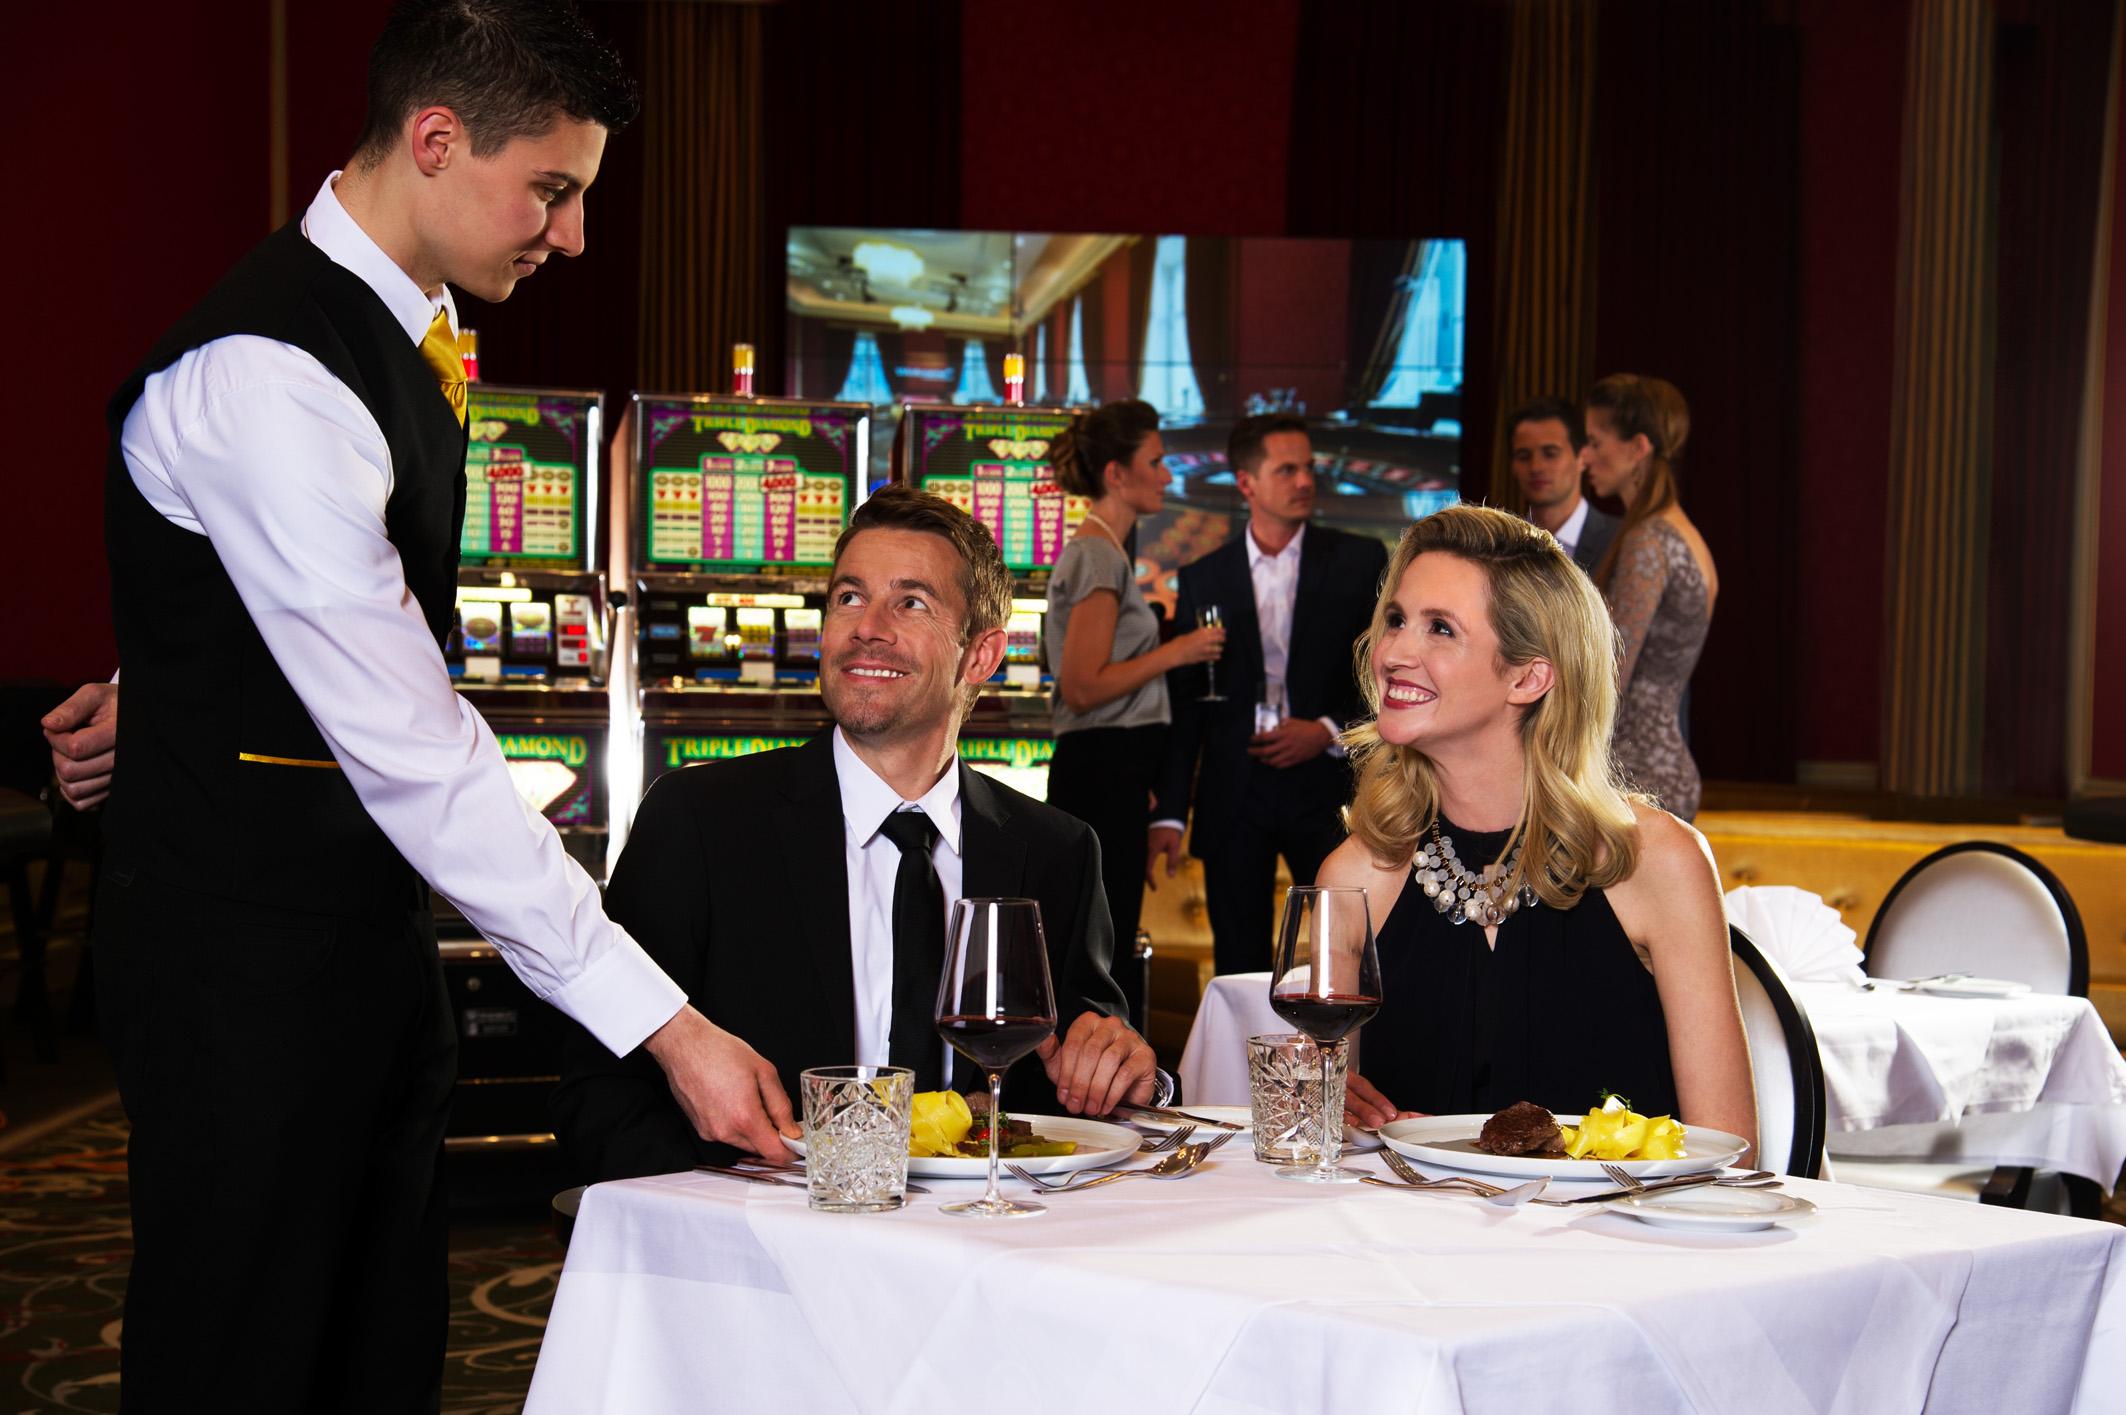 dinner and casino